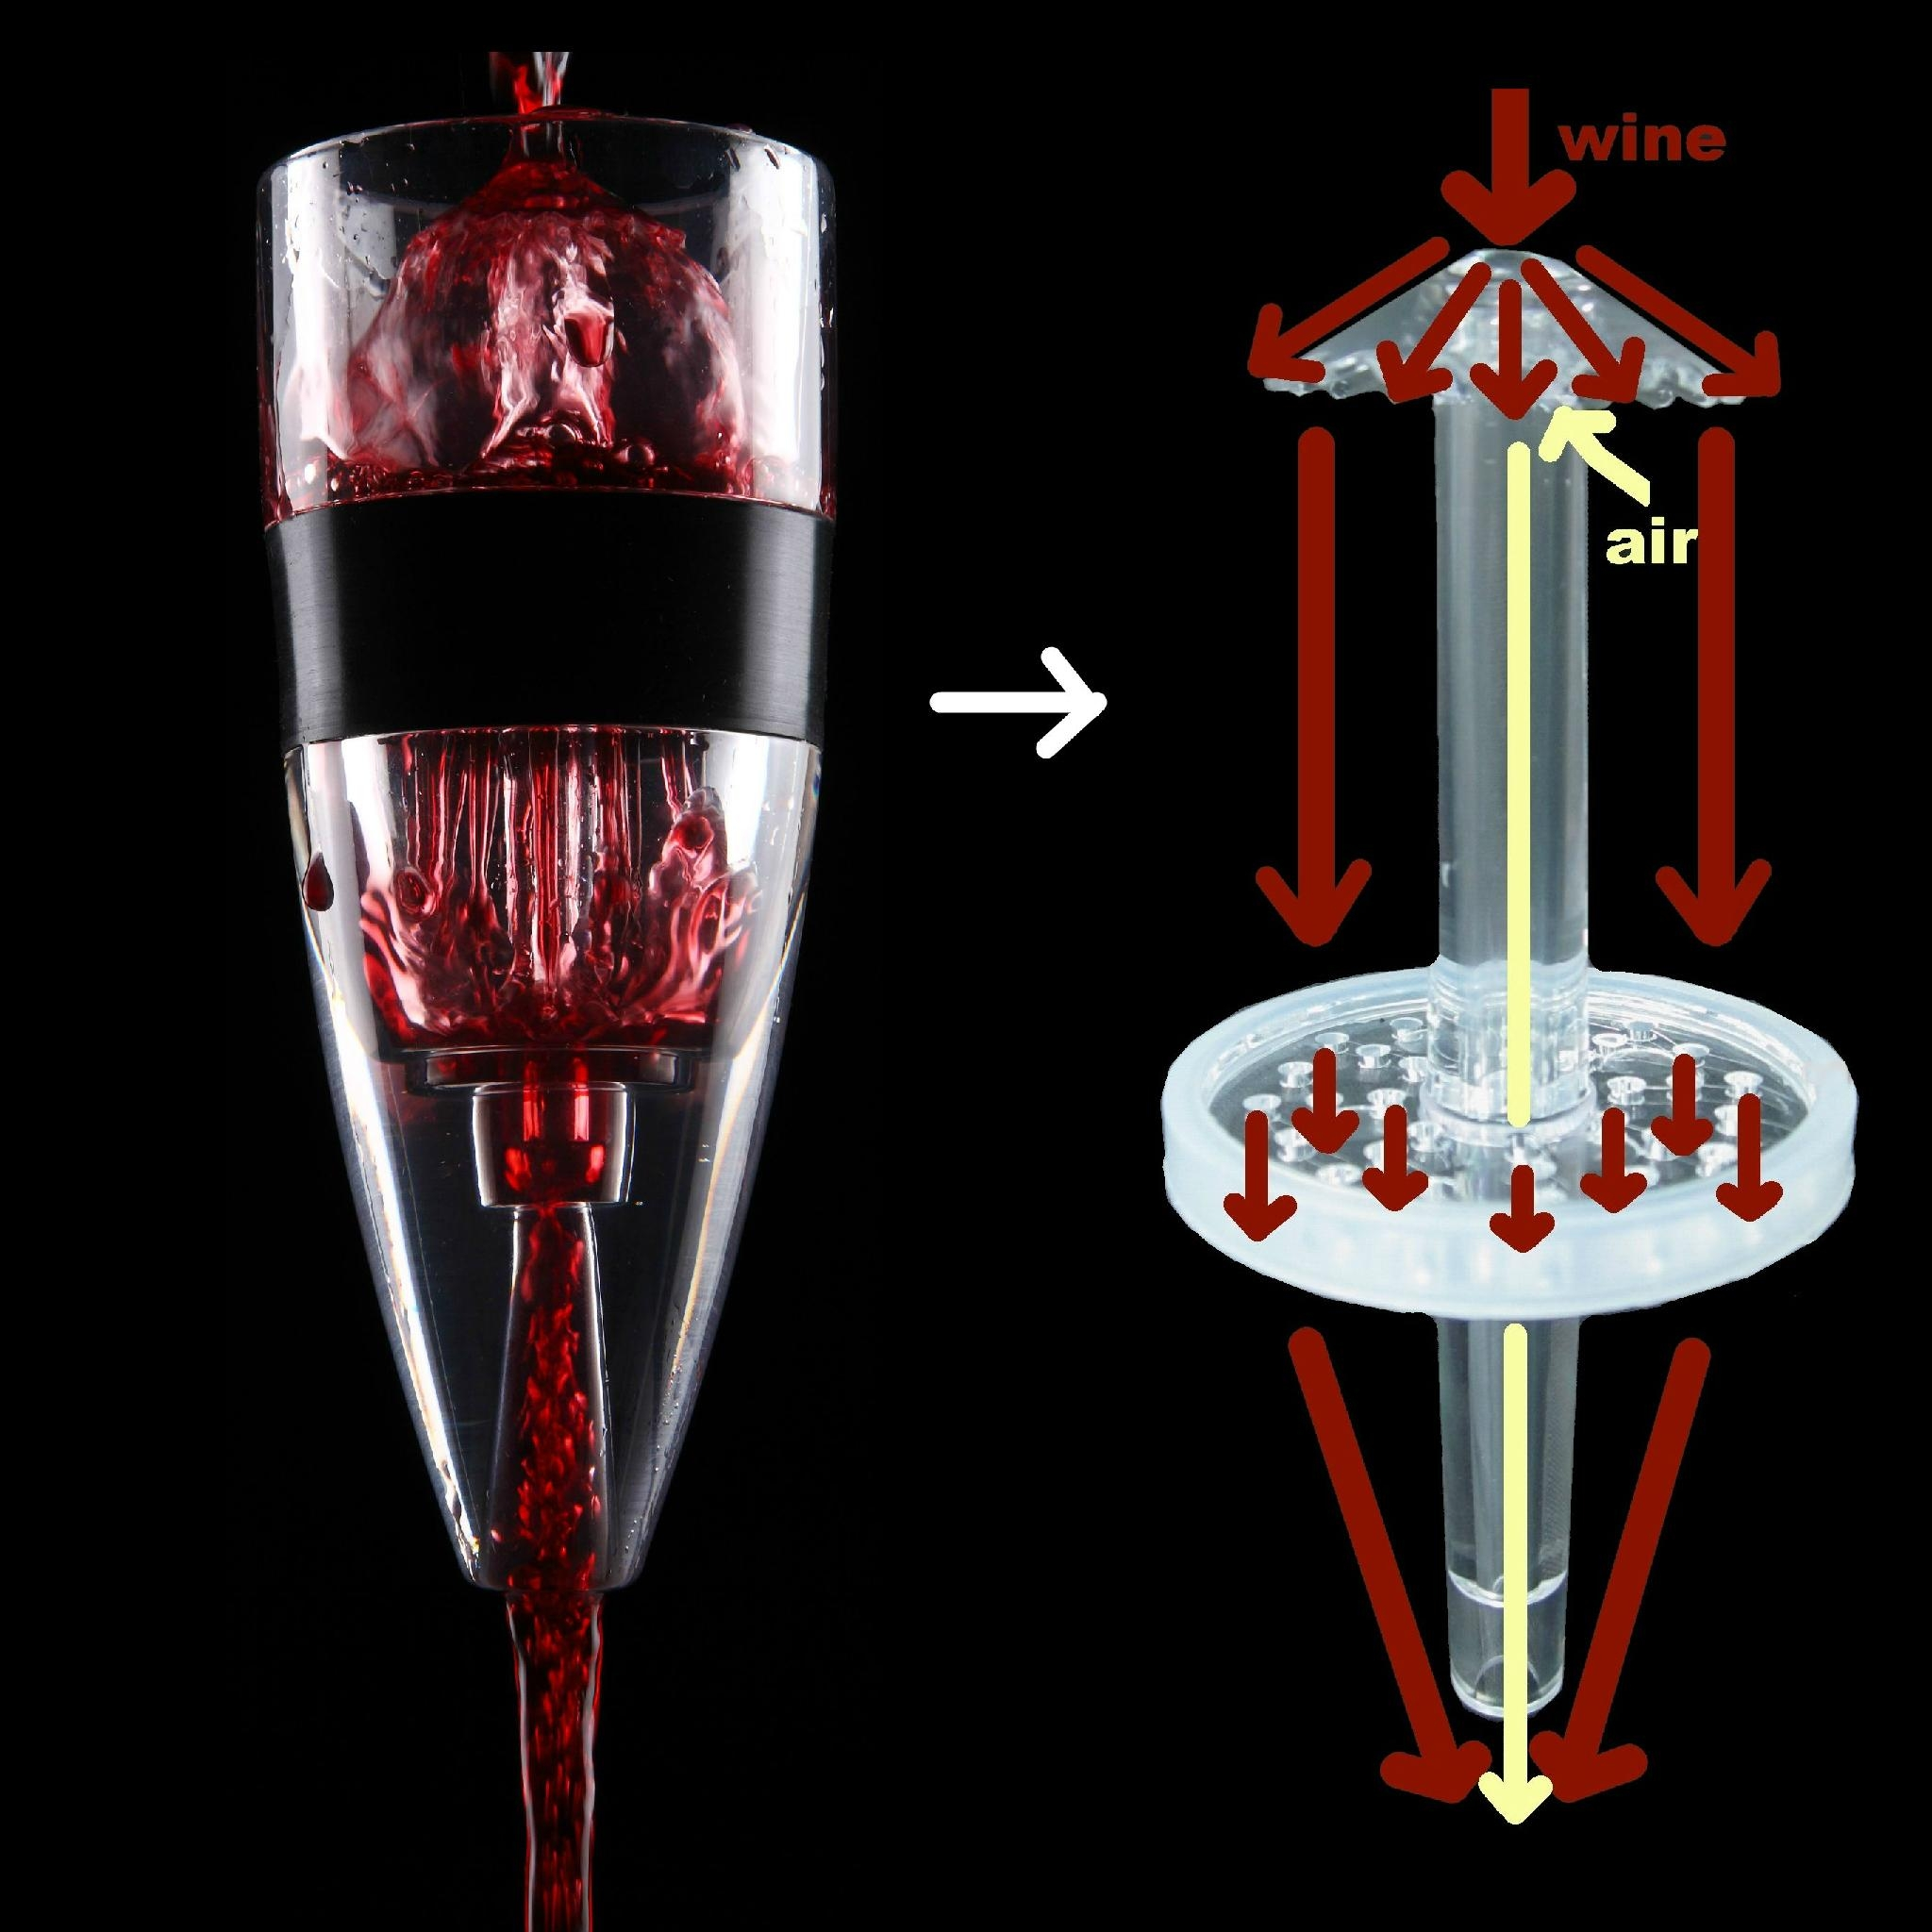 Global patented 3-step wine aerator 3